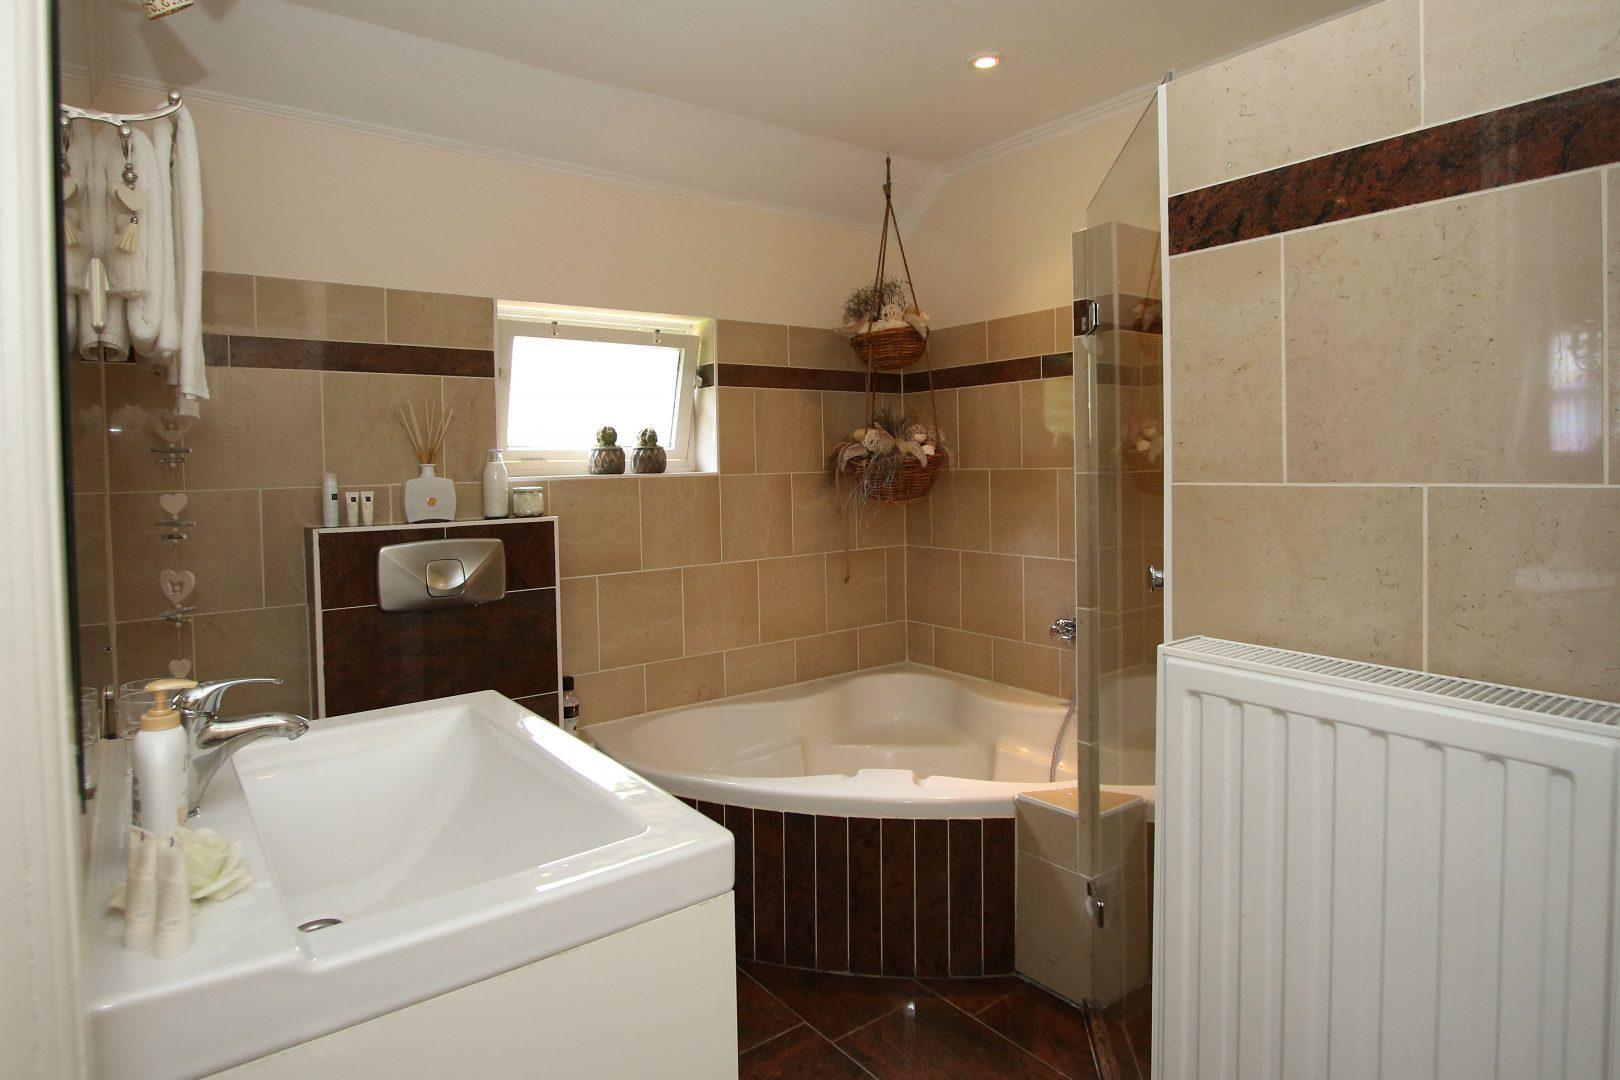 Badkamer Met Kiezelvloer : Woonkamer tegels badkamer vloer unique woonkamer vloer